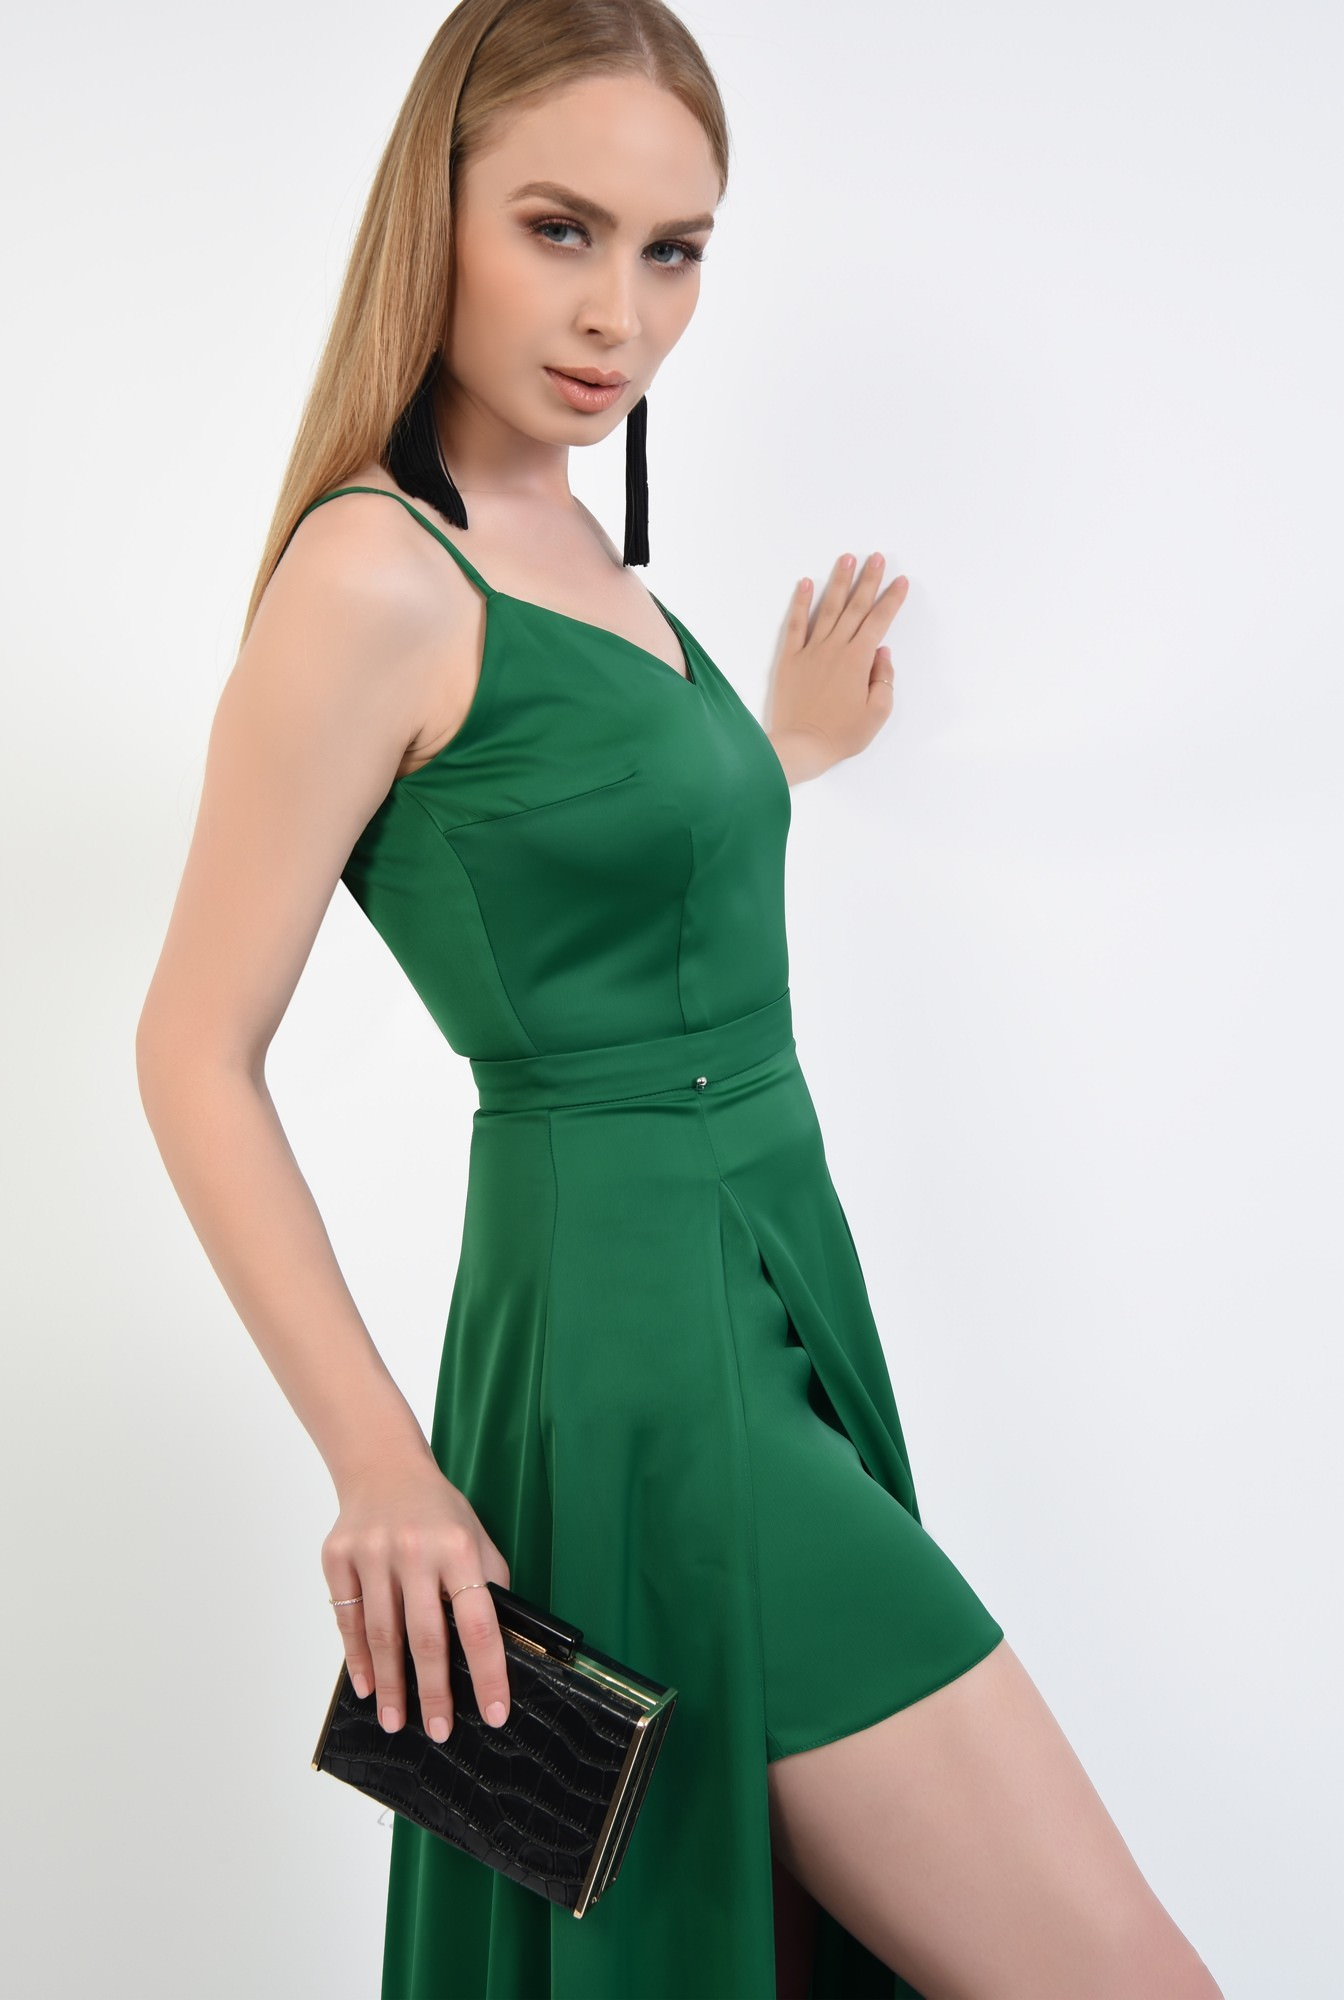 2 - rochie de seara, slit adanc, verde, smarald, bretele subtiri